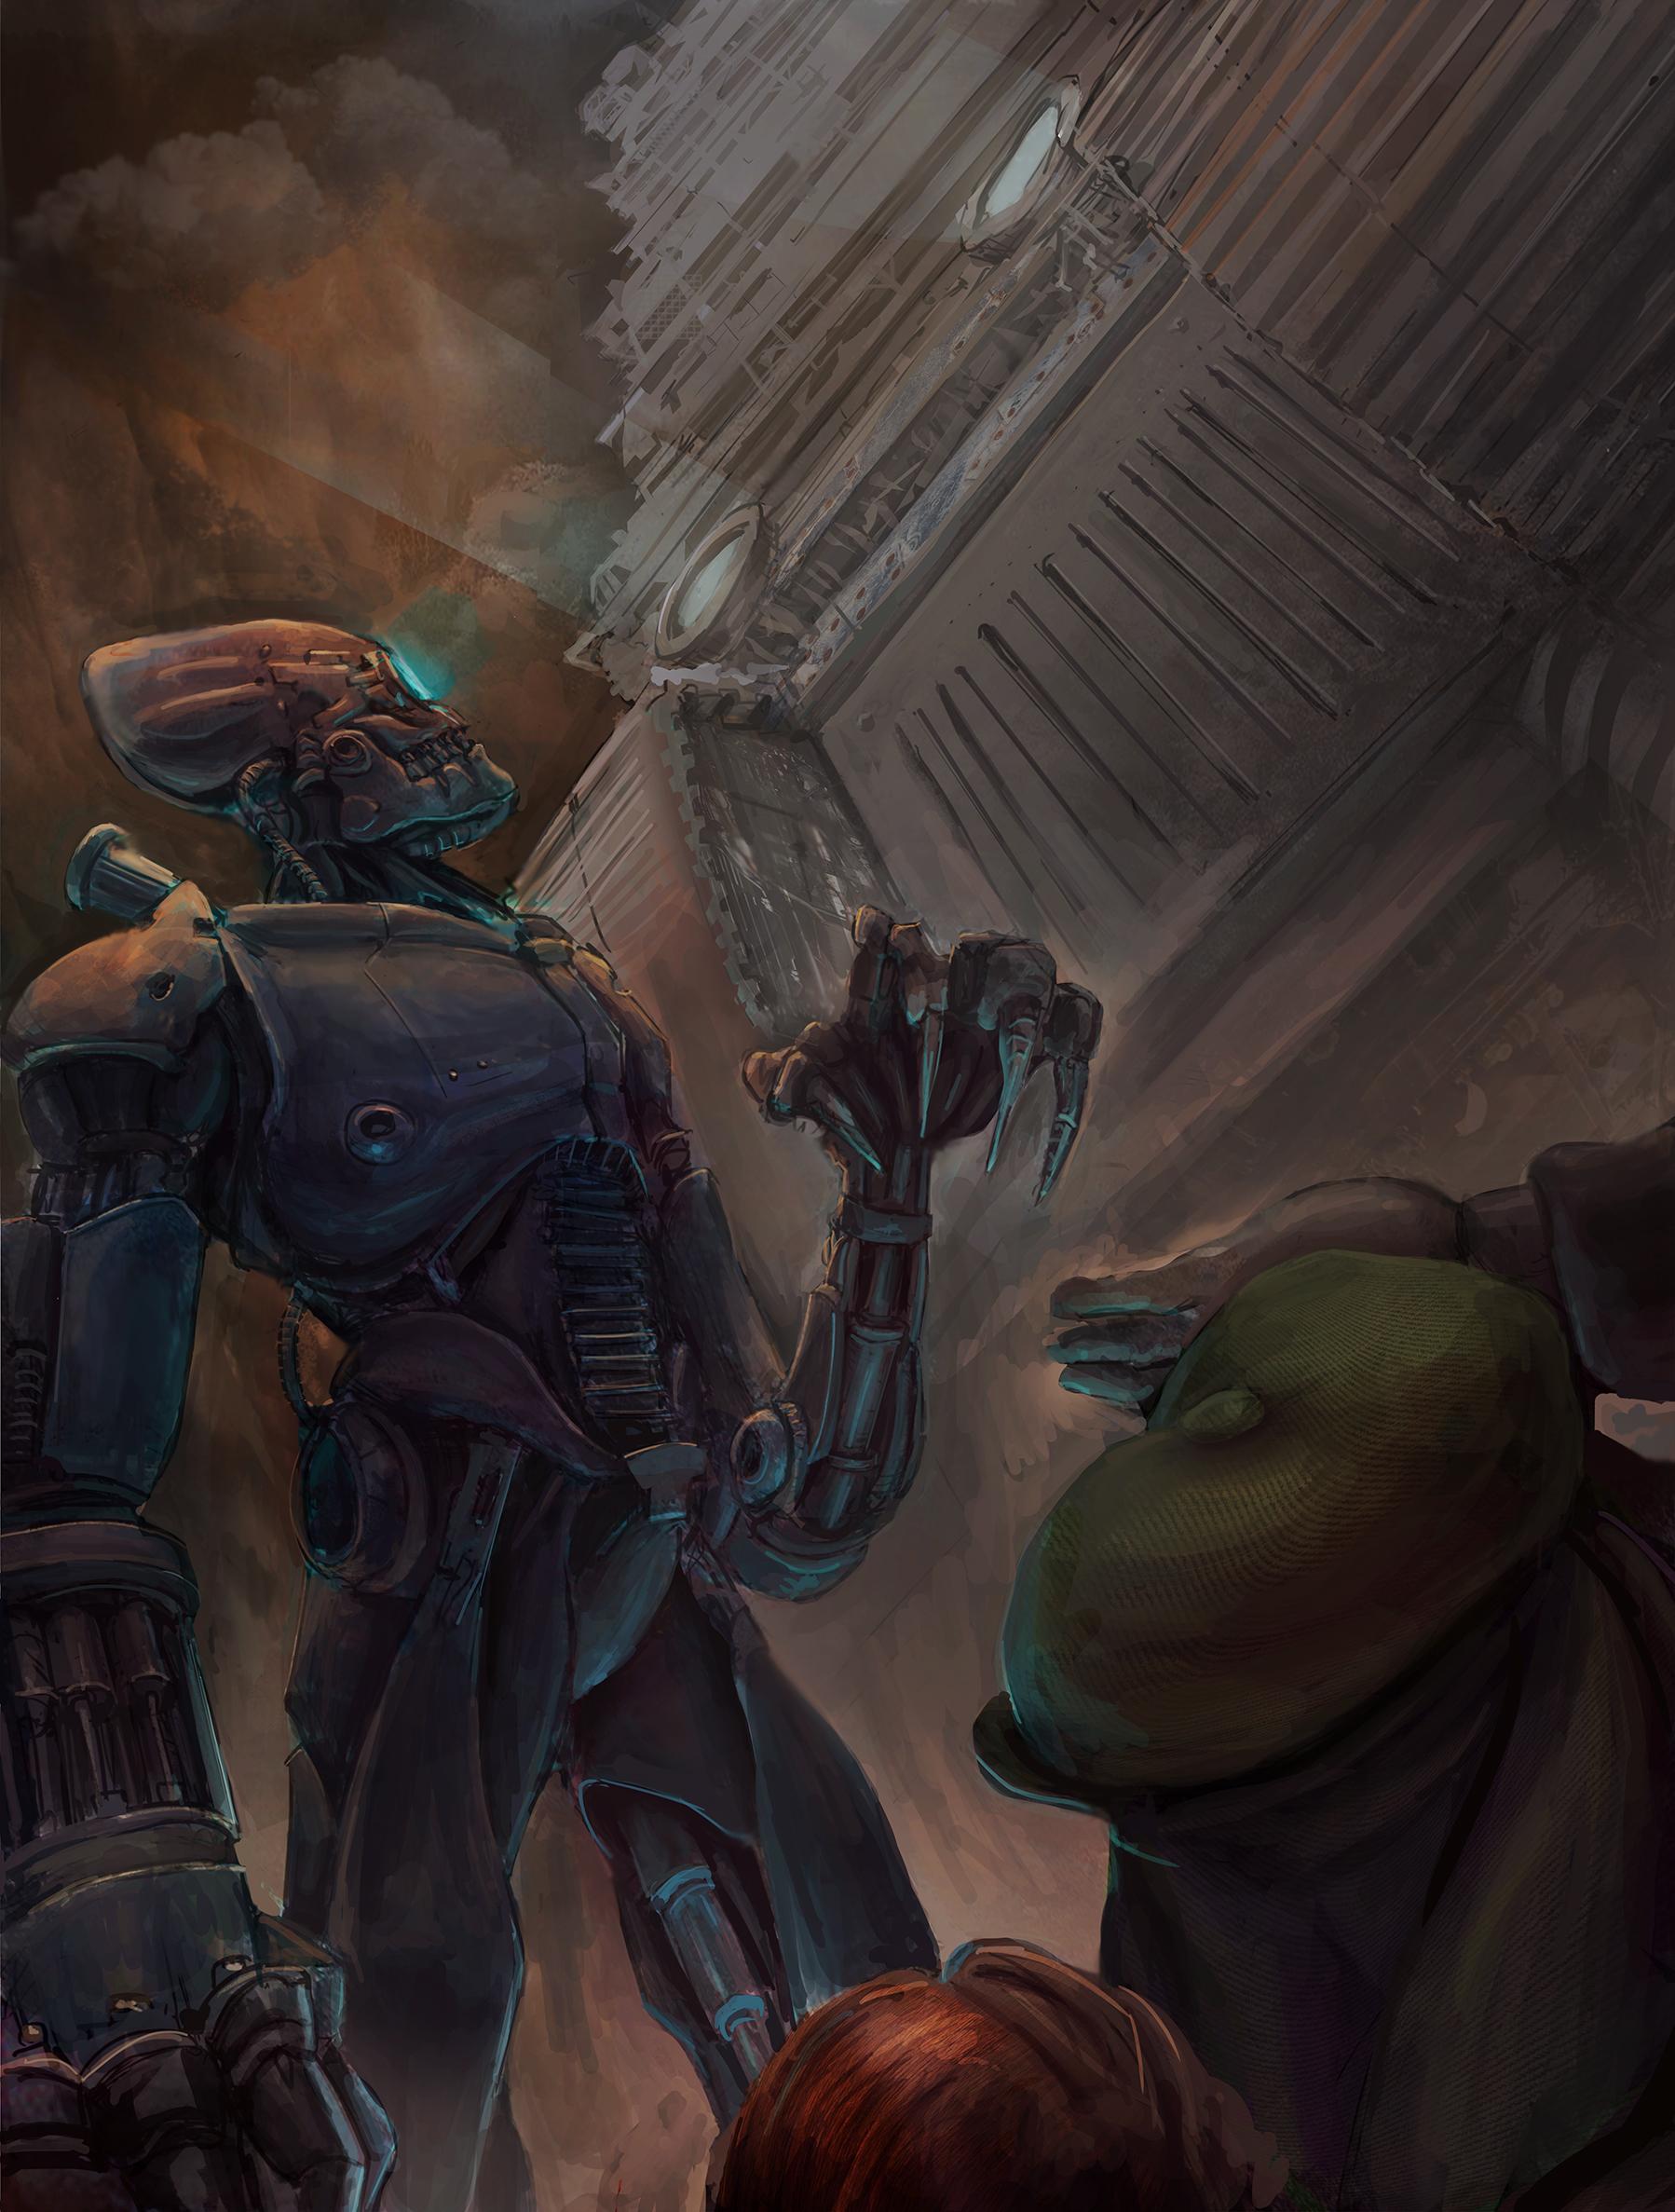 Mortal engines illustration